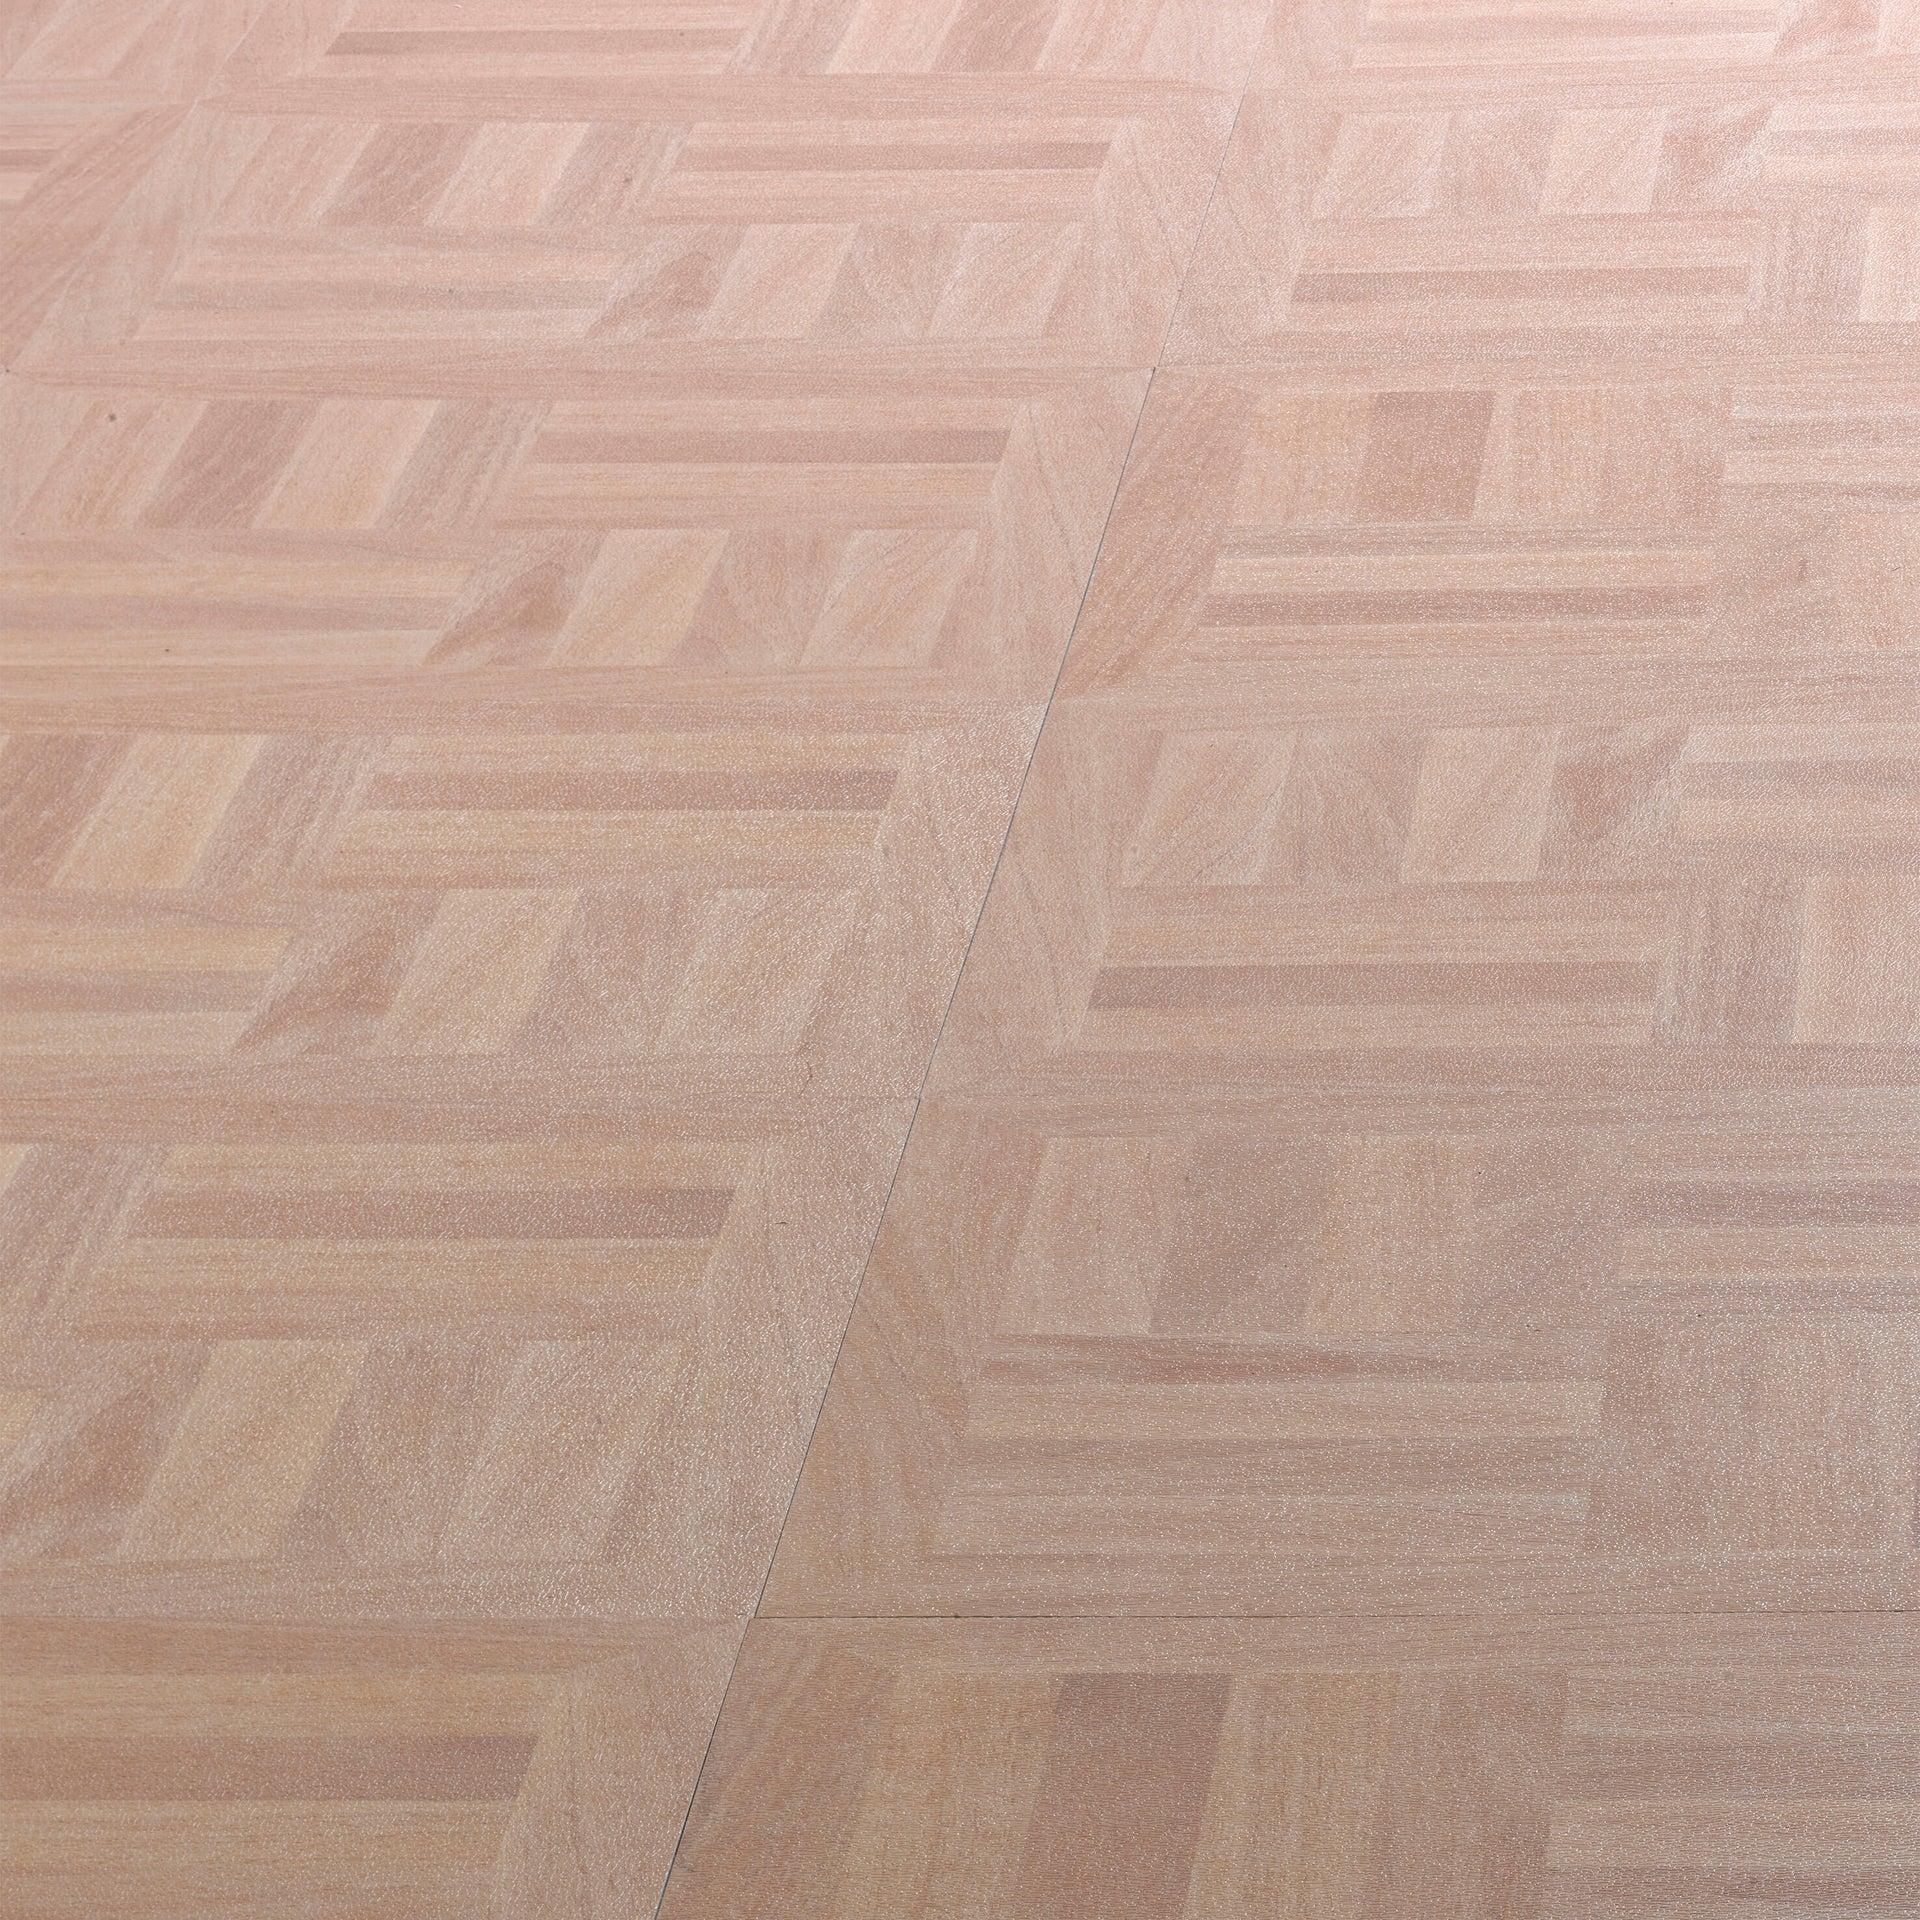 Pavimento PVC adesivo Dugan Sp 1.2 mm giallo / dorato - 4